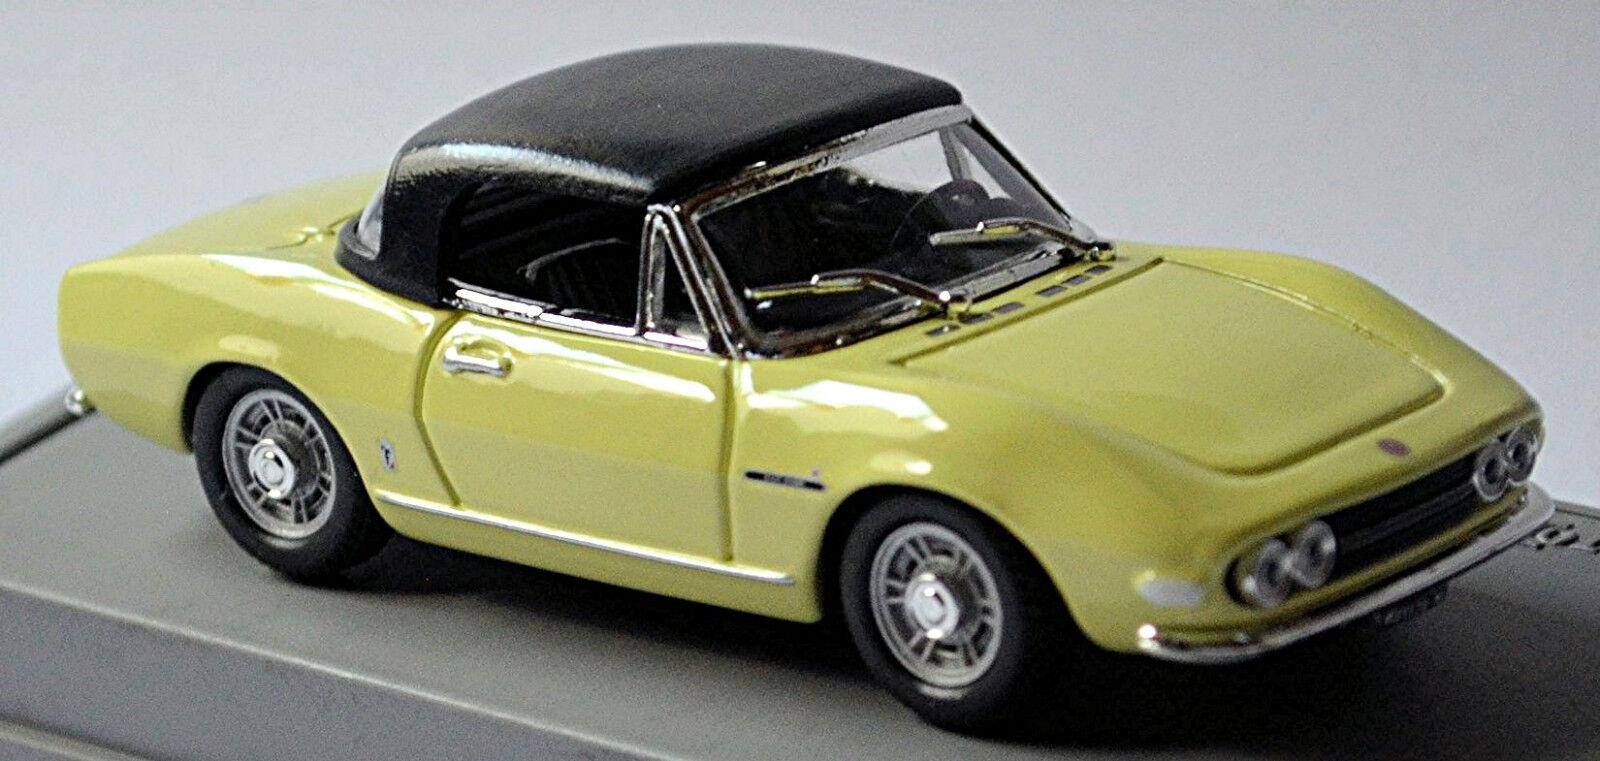 Fiat Dino Araignée 2400 Toit Rigide 1969-72 jaune jaune 1 43 ProgettoK